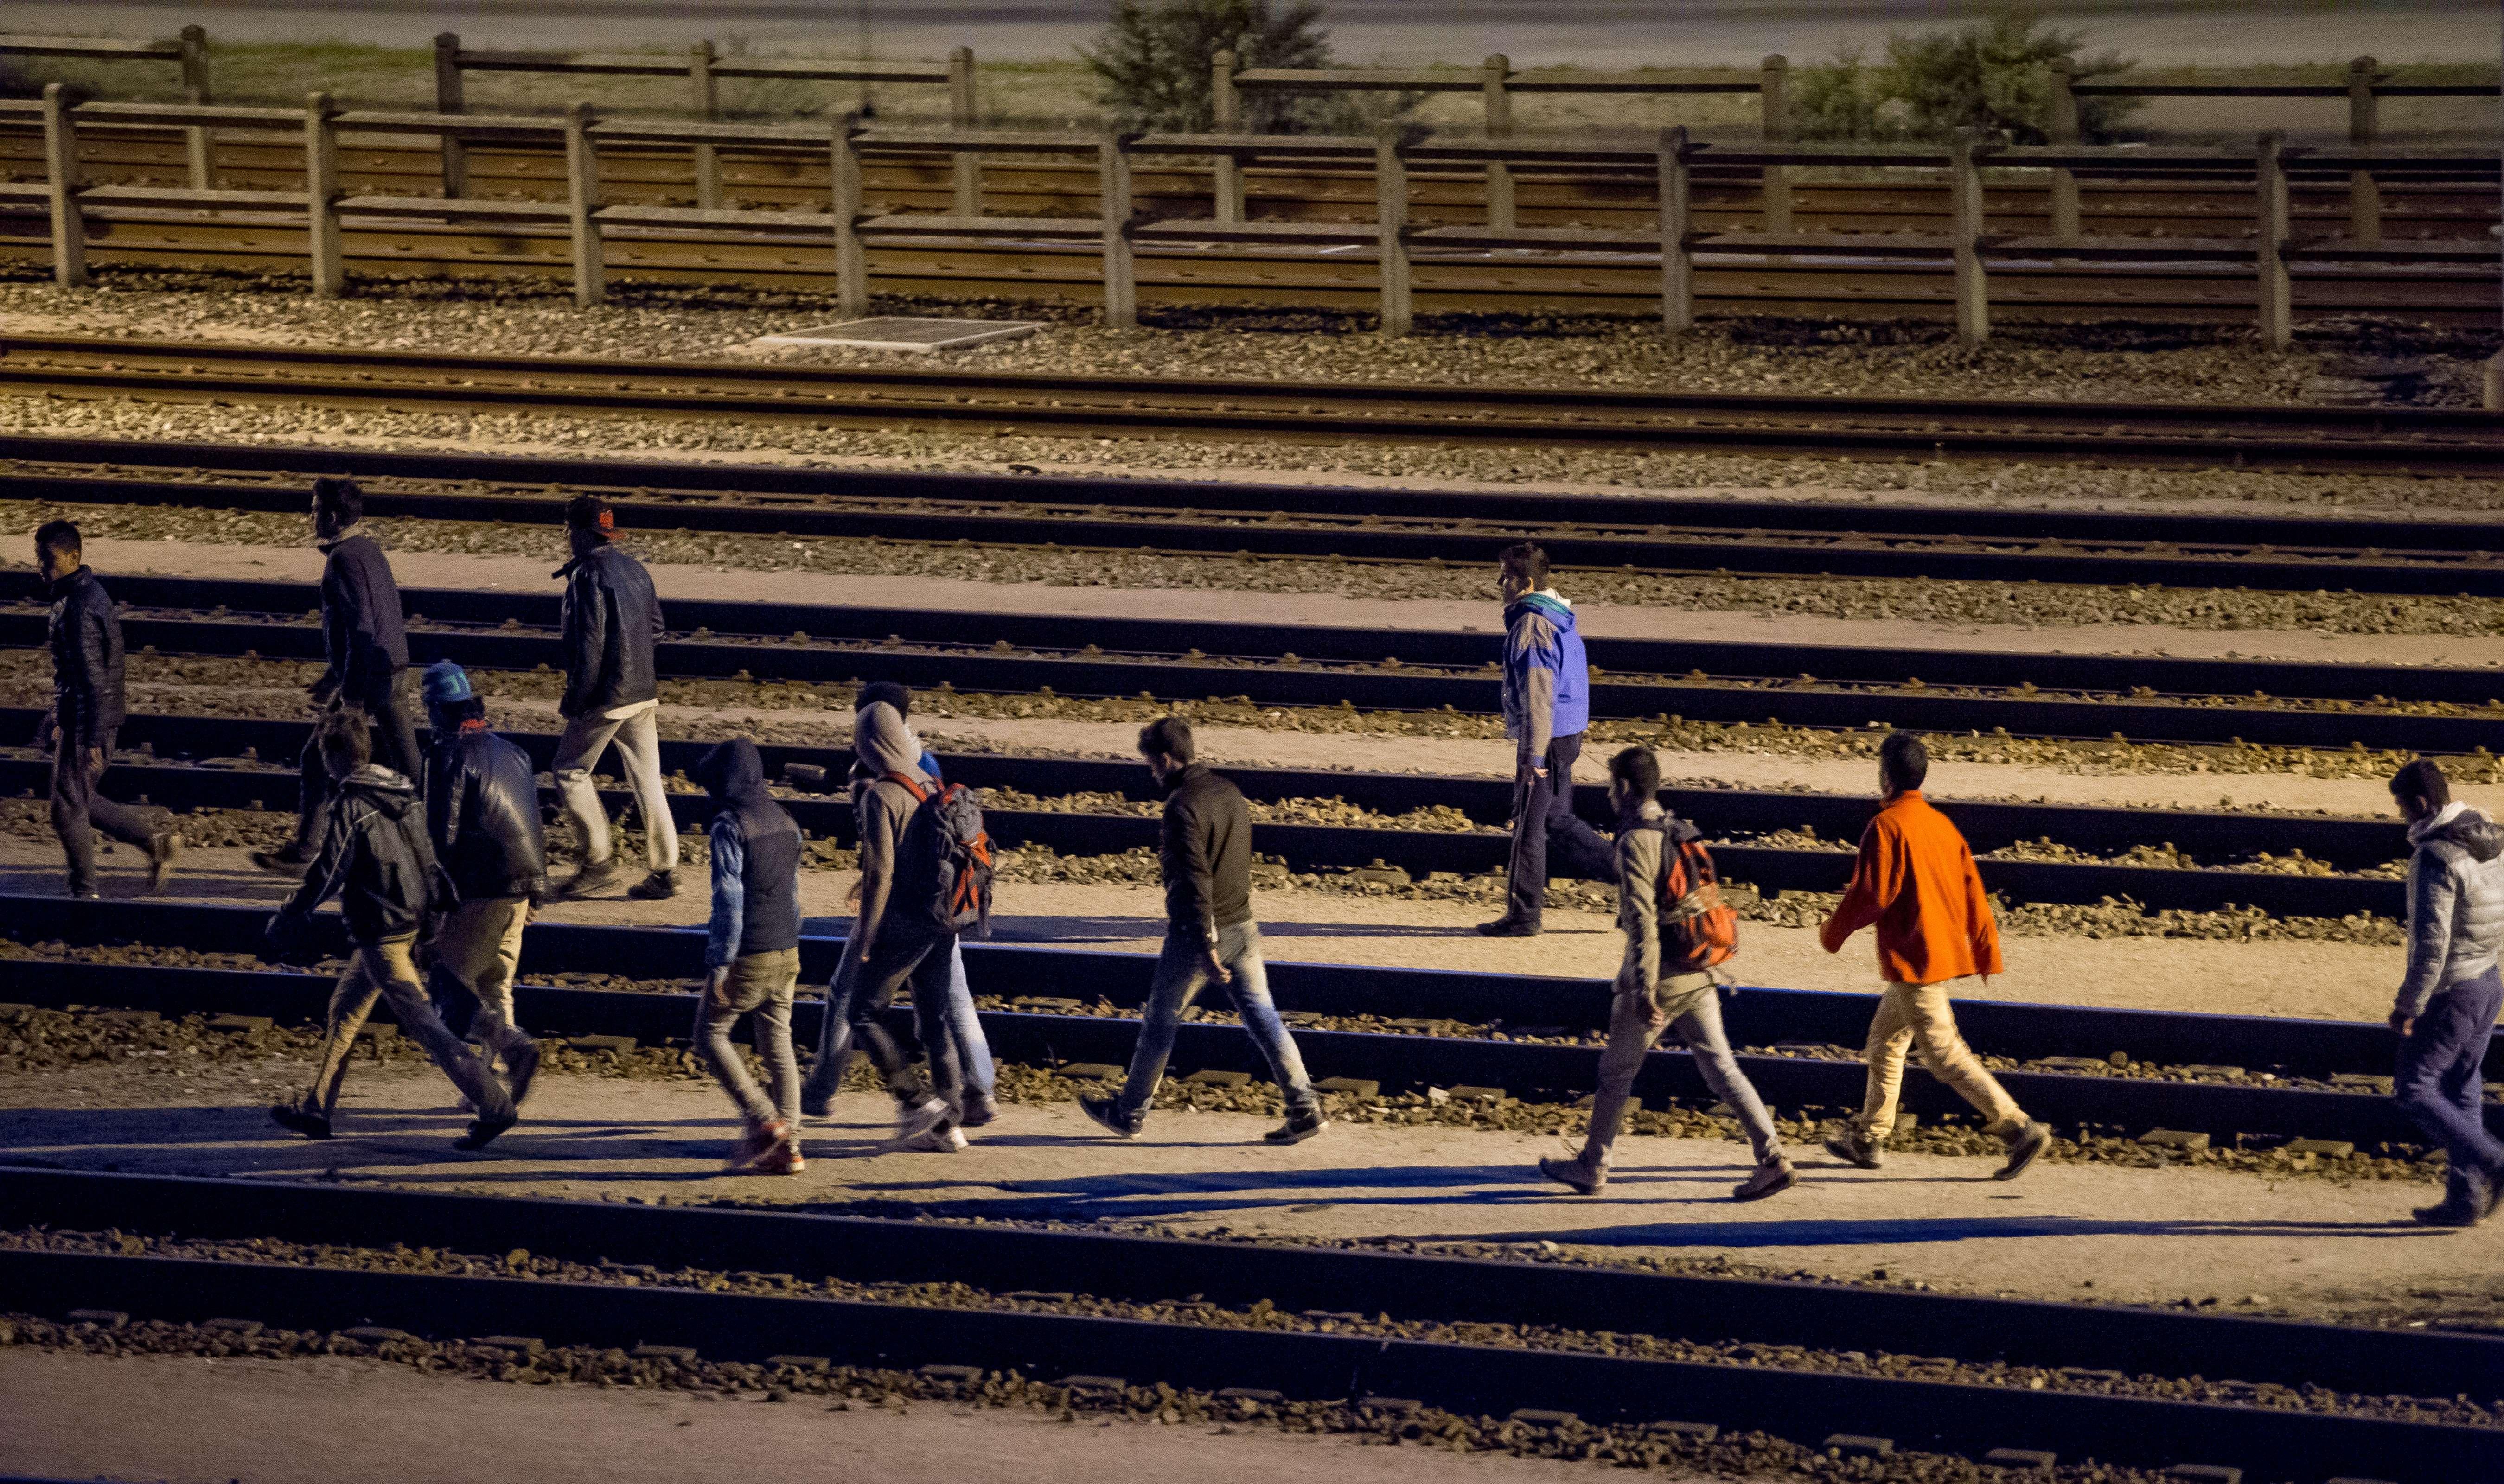 Migrants walk along railway tracks at the Eurotunnel terminal on July 28, 2015, in Calais-Fréthun.